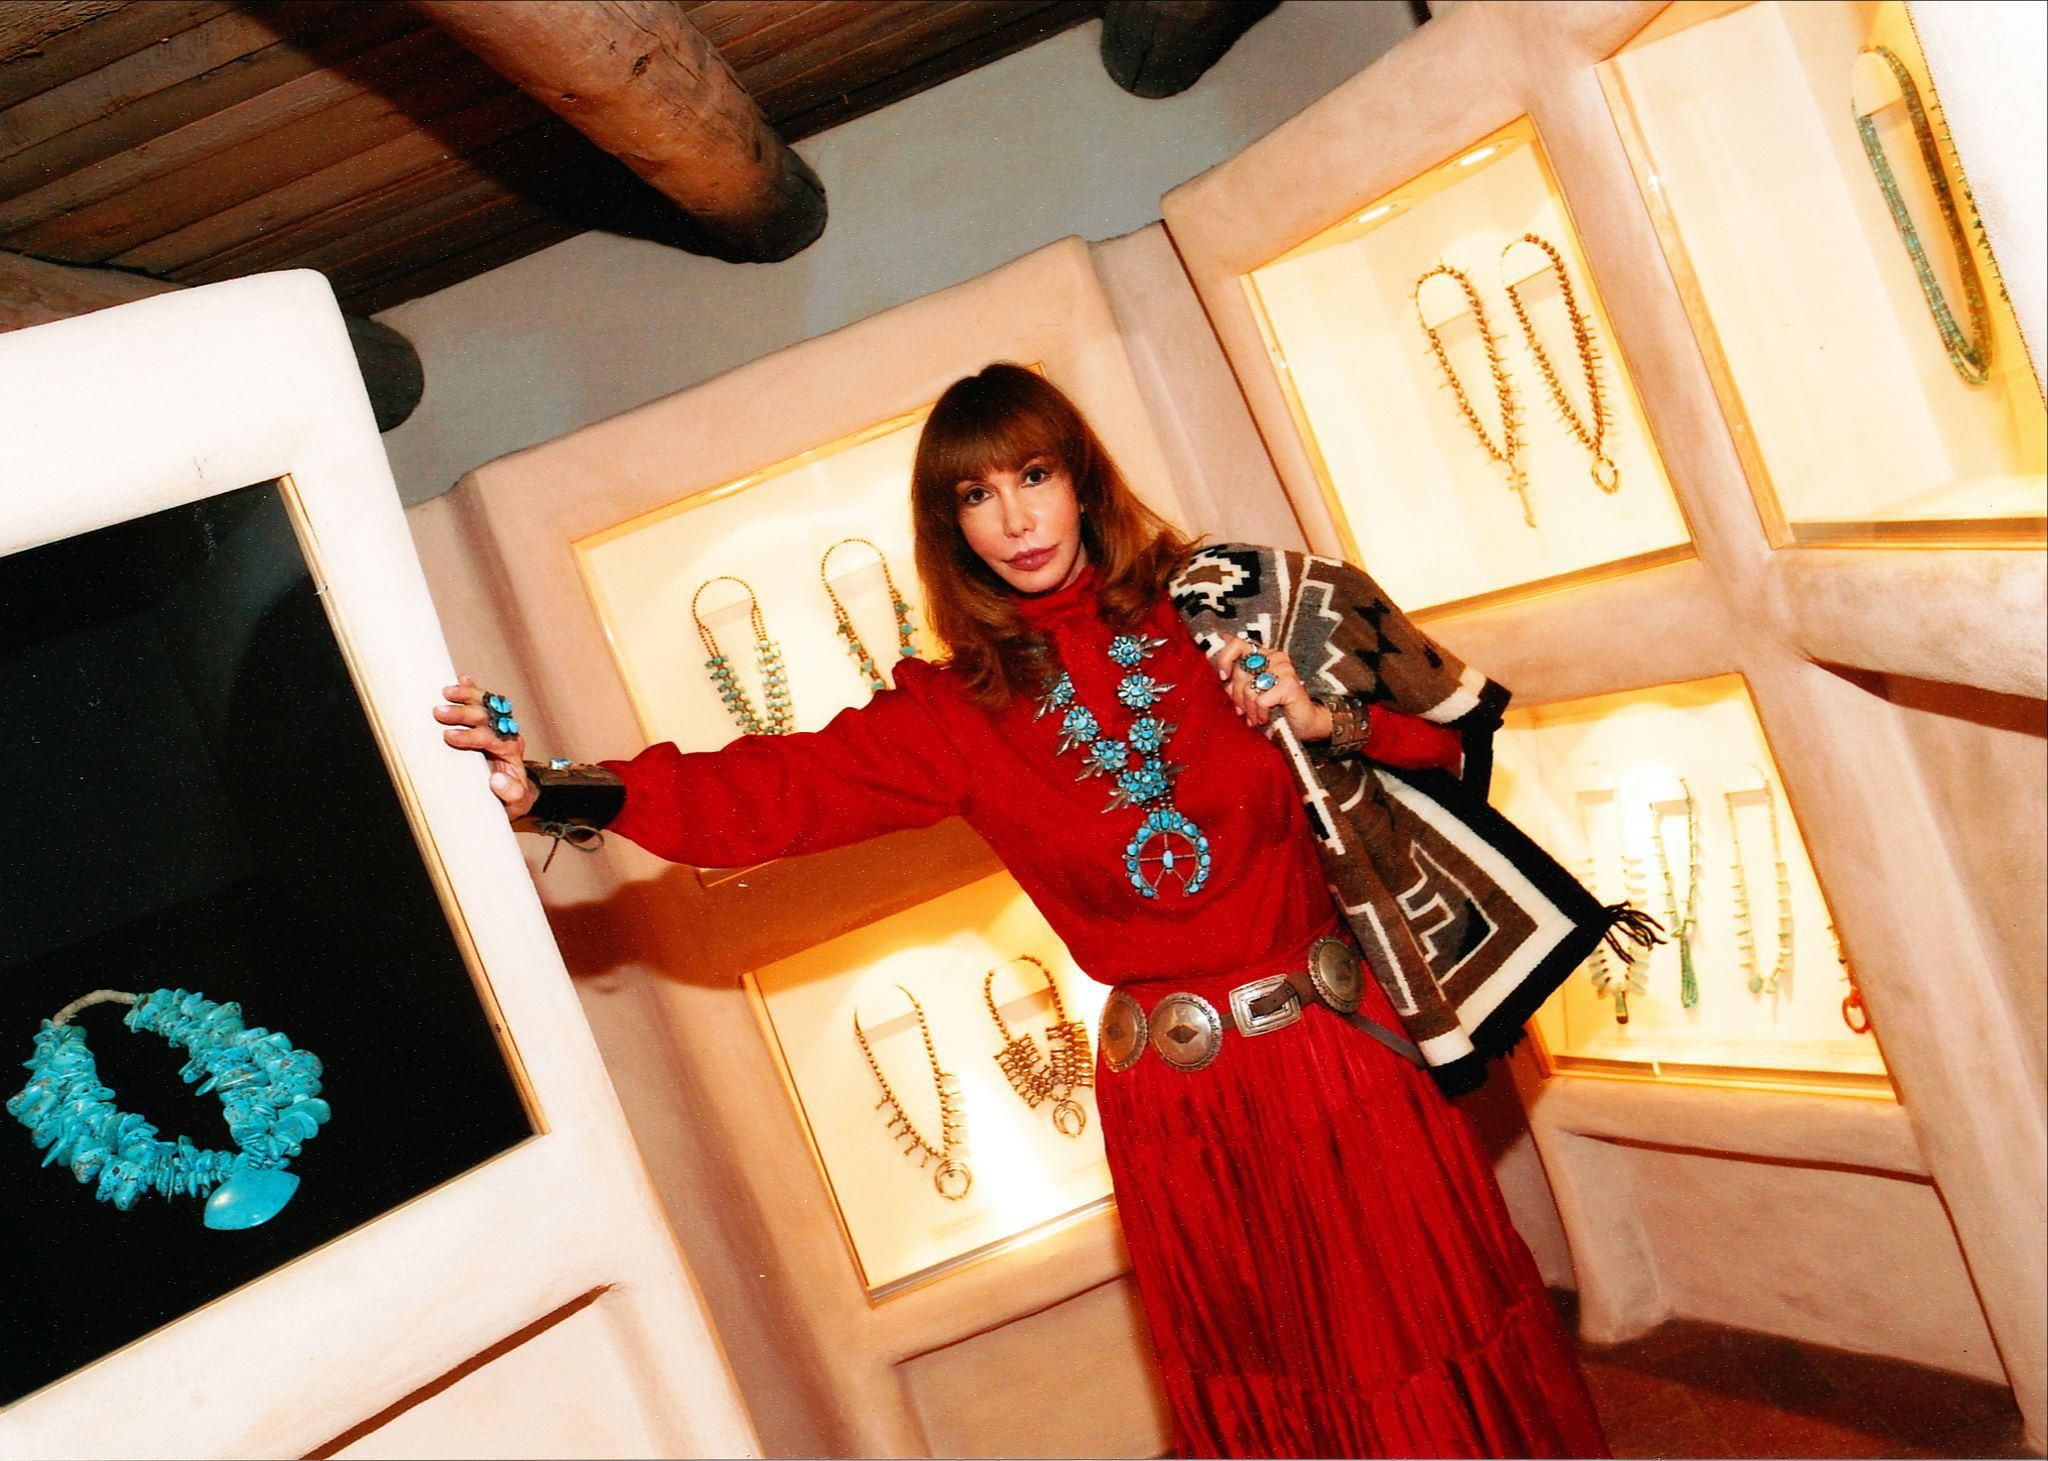 Christina lucia peralta ramos millicent rogers museum web